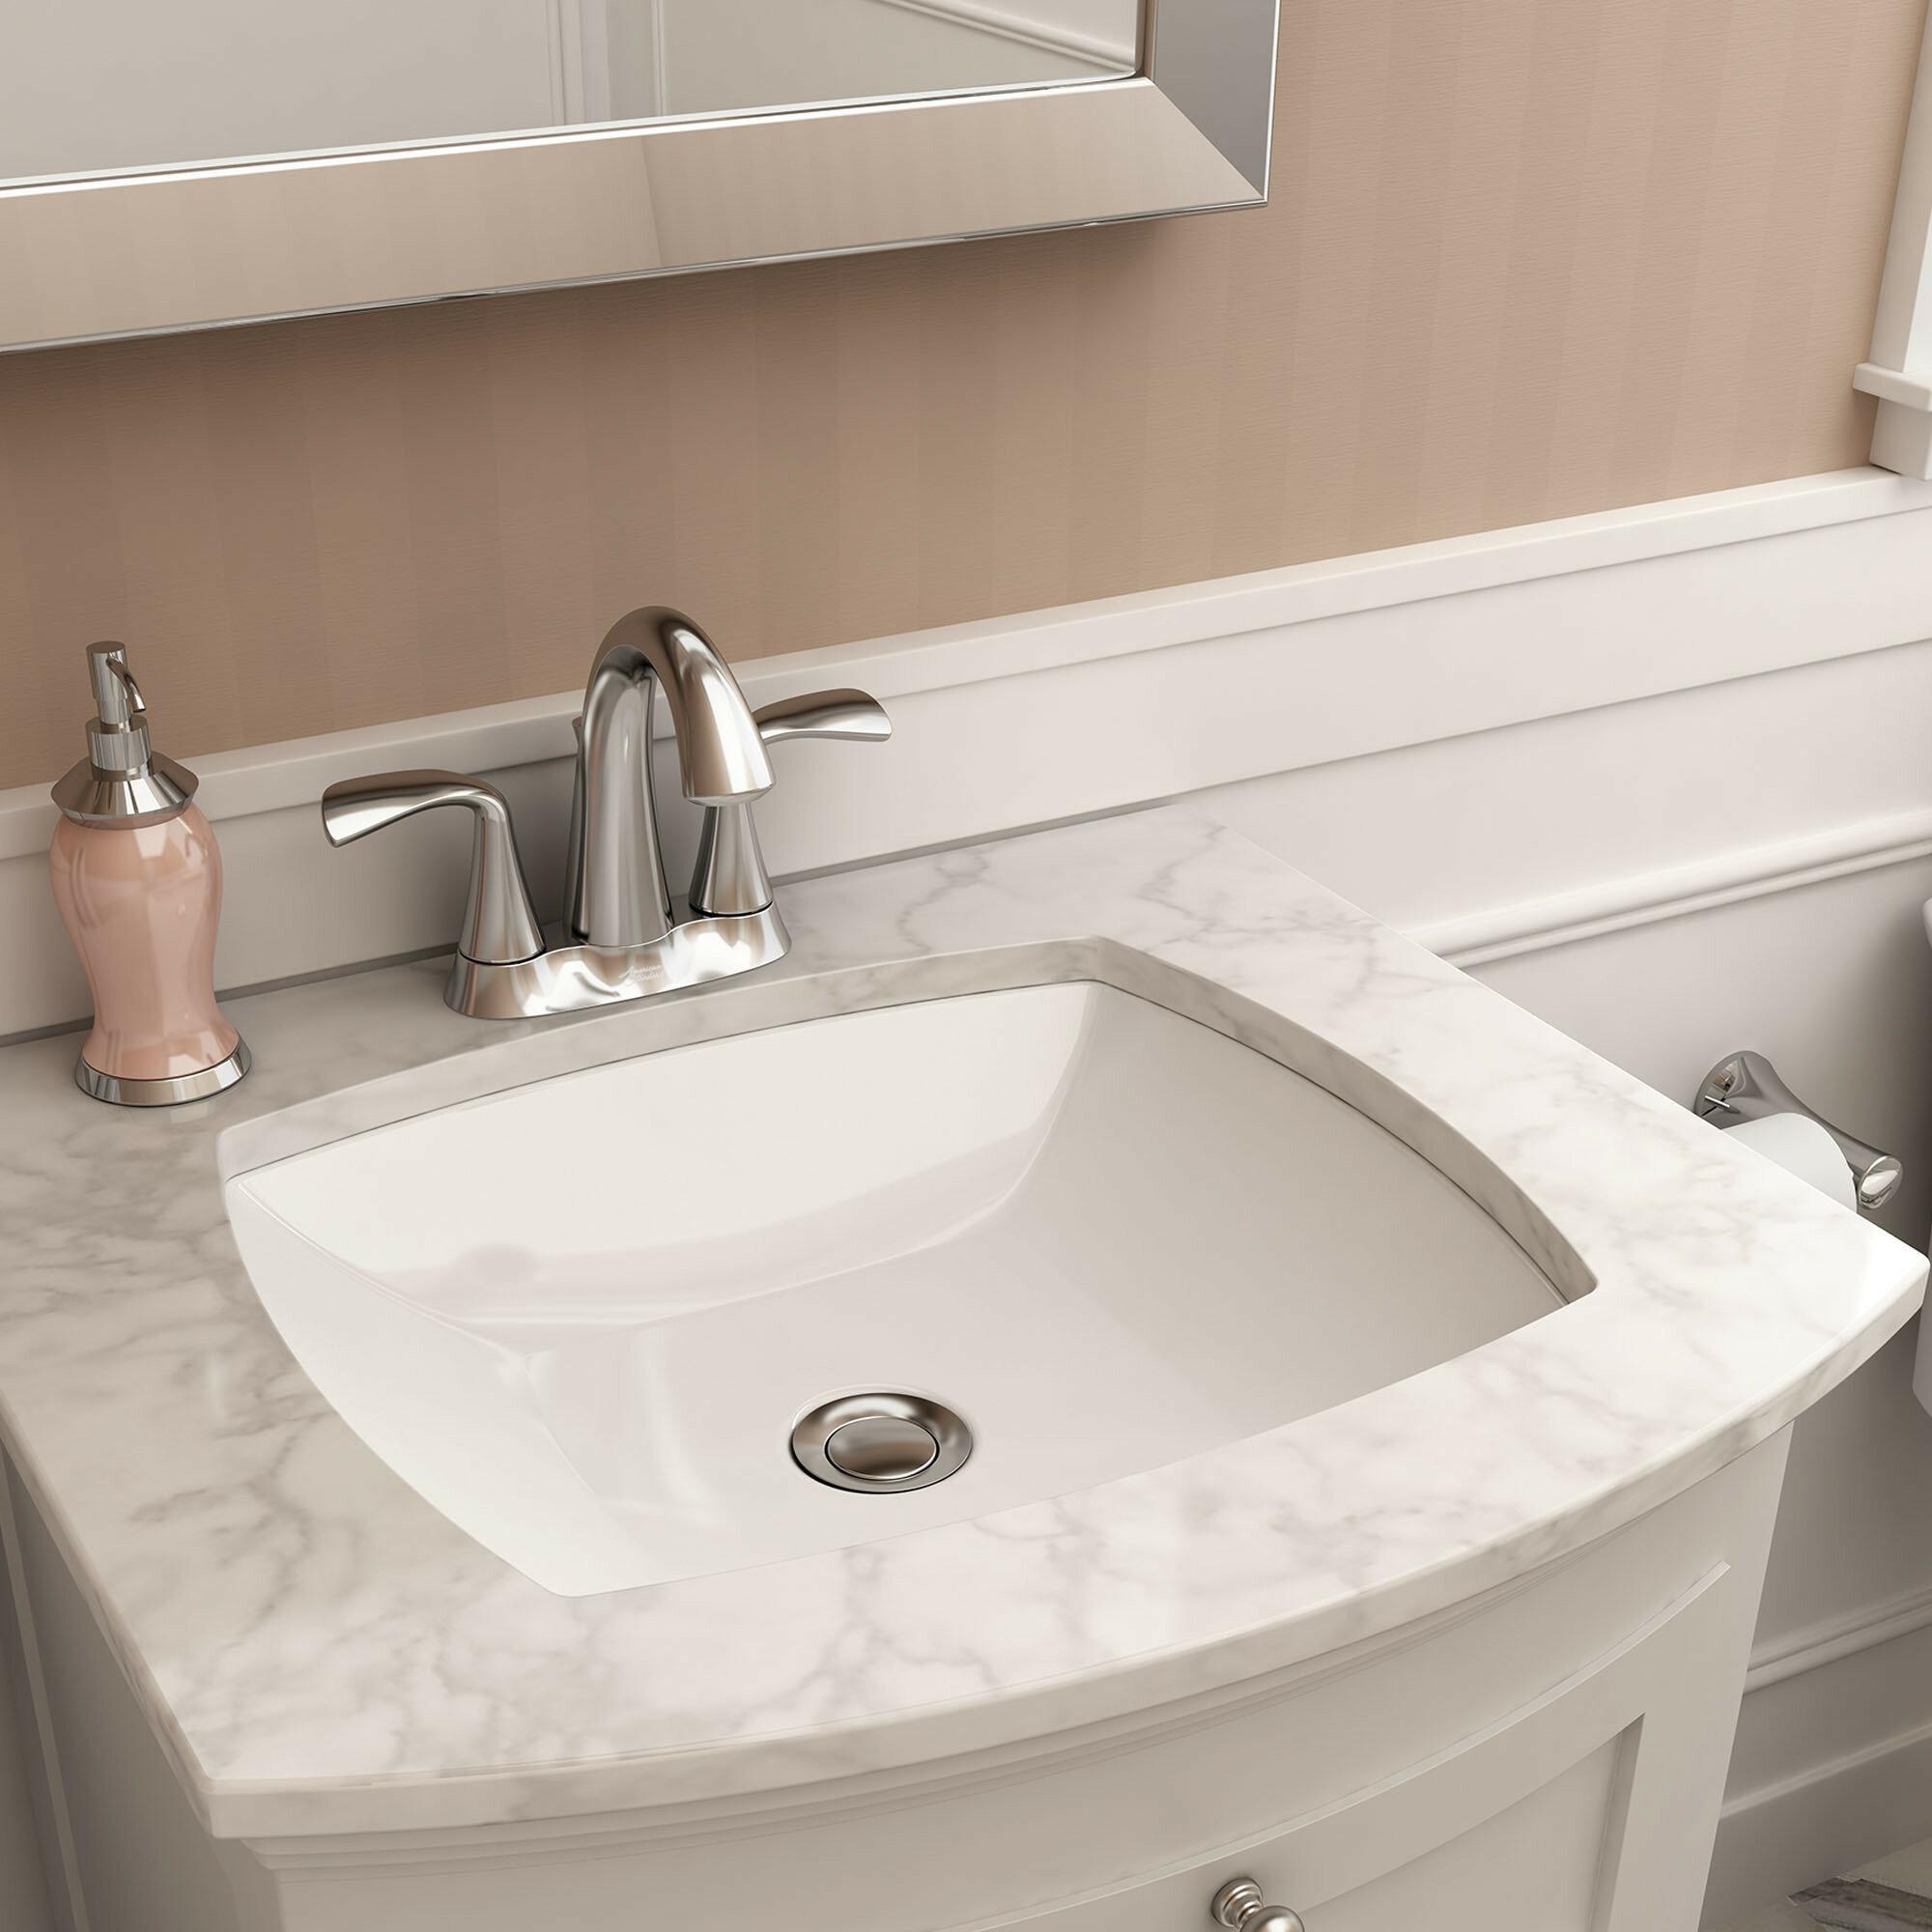 sink reviews bathroom undermount ceramic with dawn overflow home wayfair improvement rectangular usa pdx